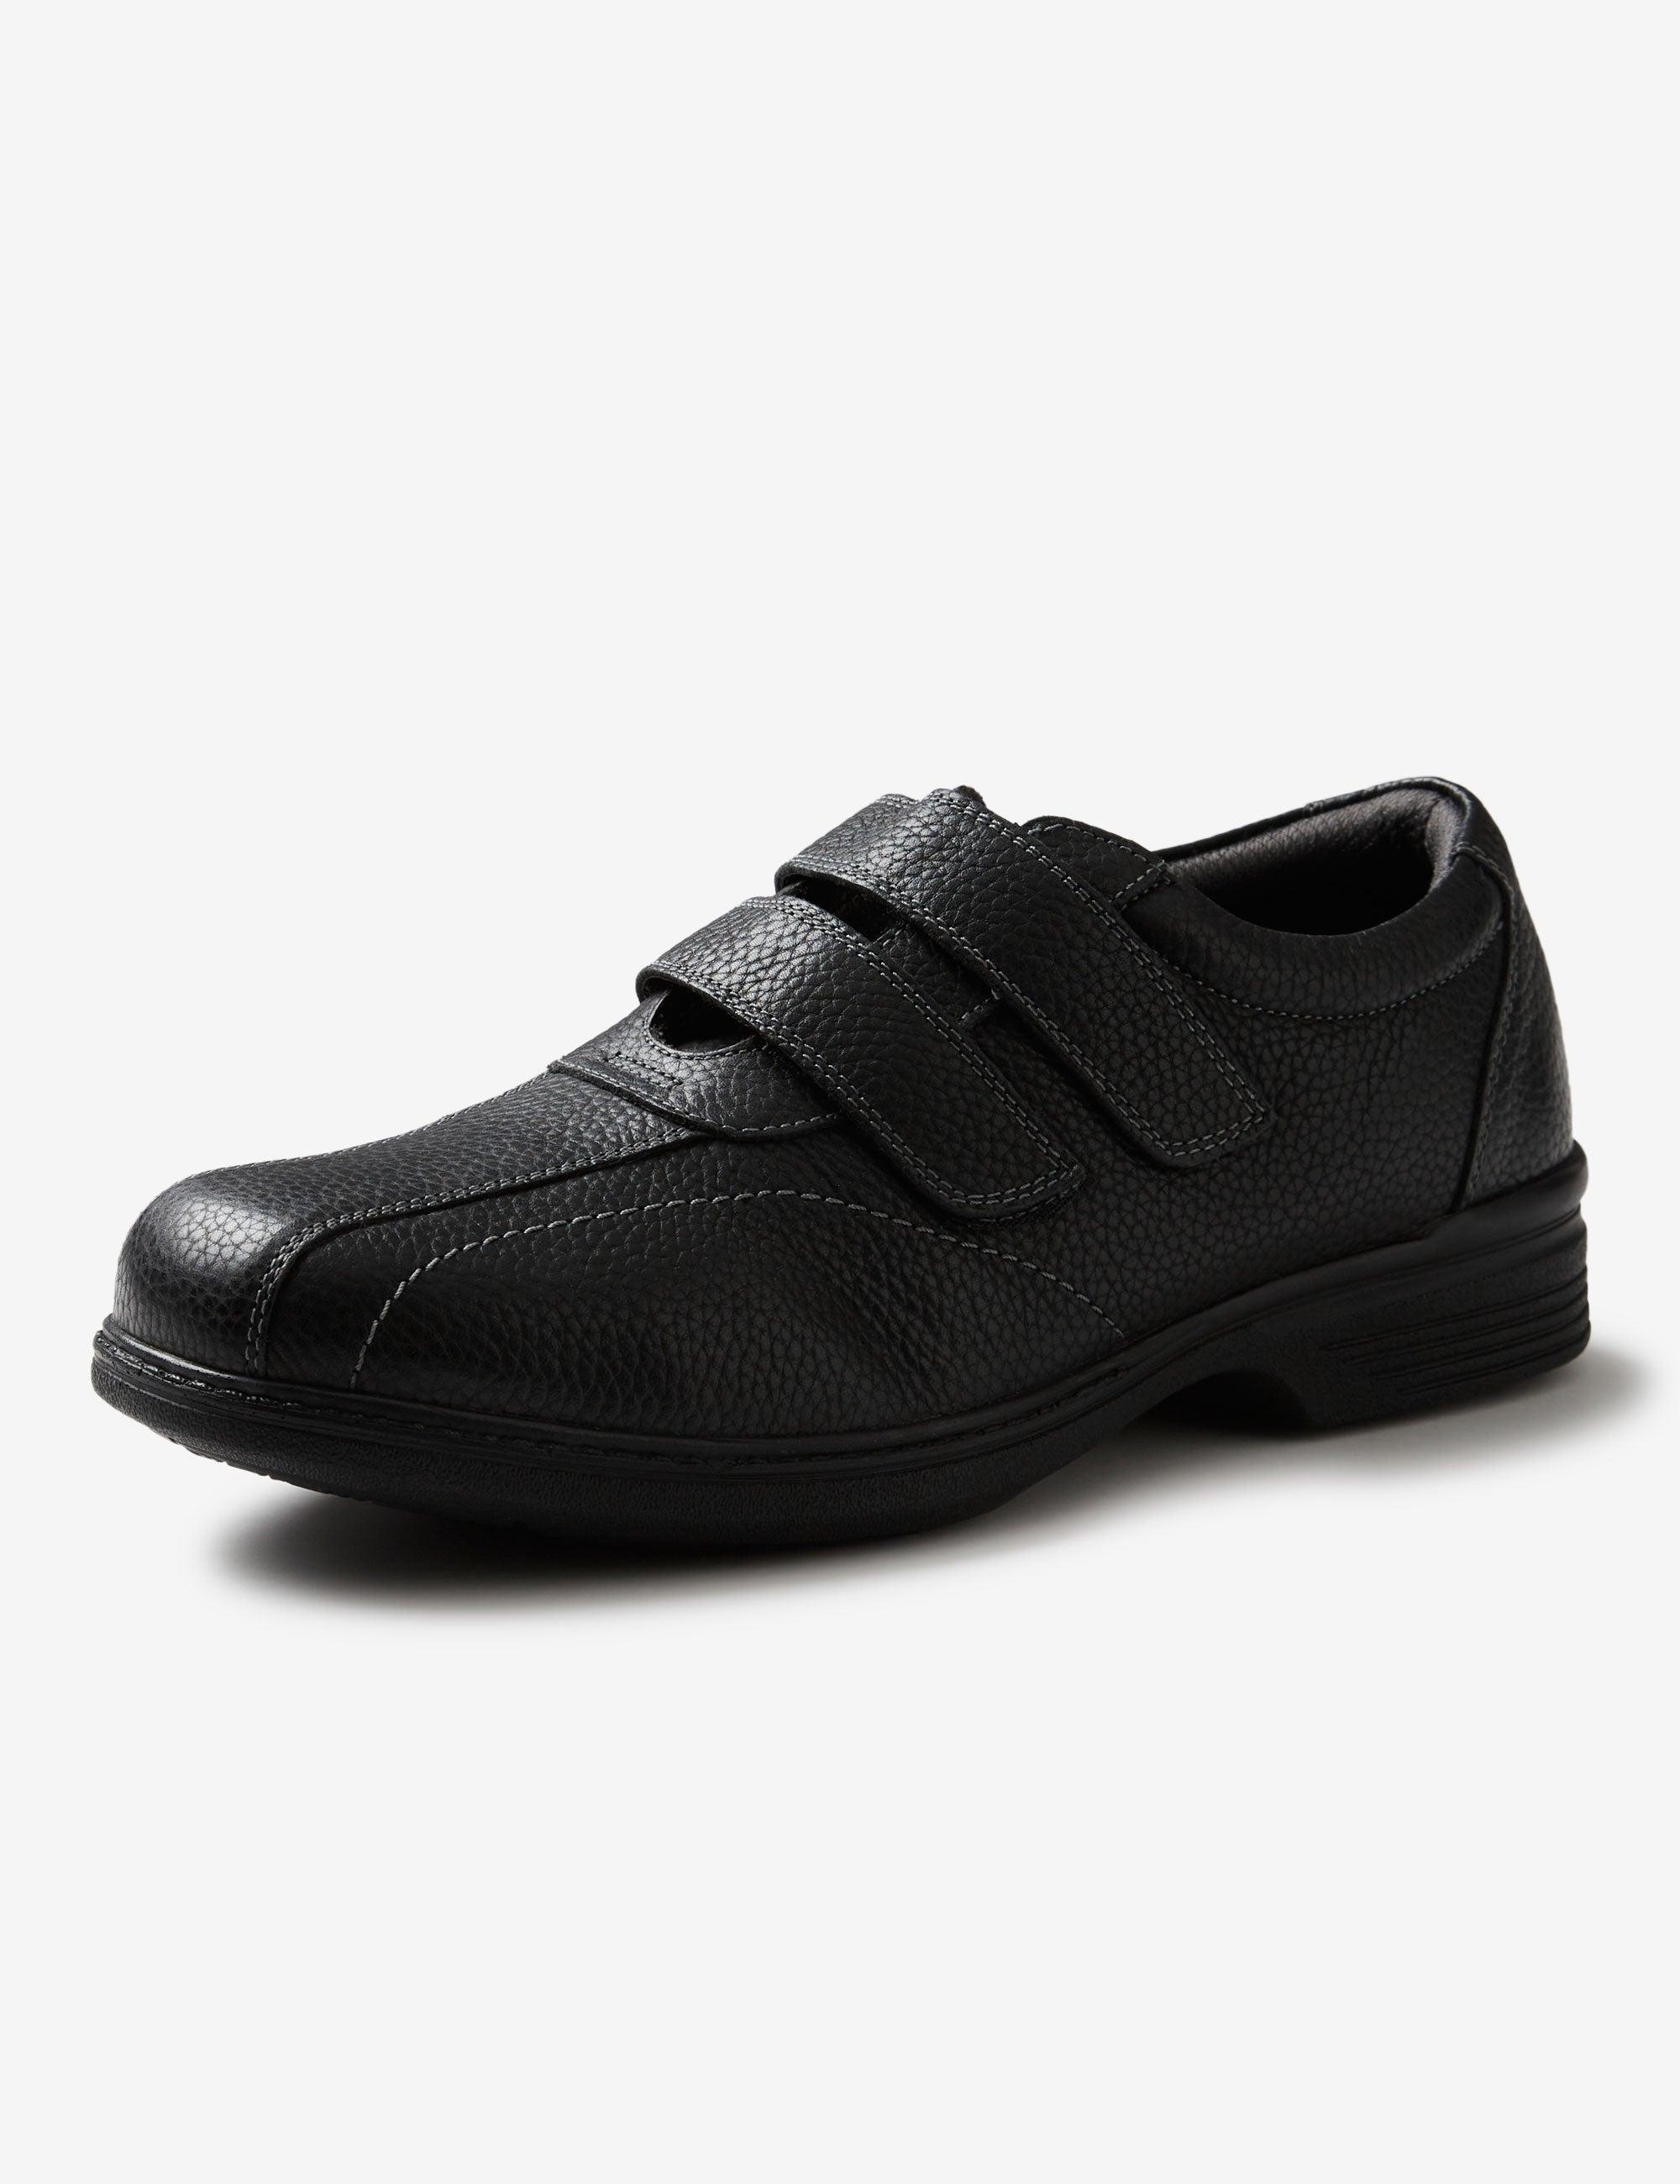 Flash Footwear Sale | Rivers